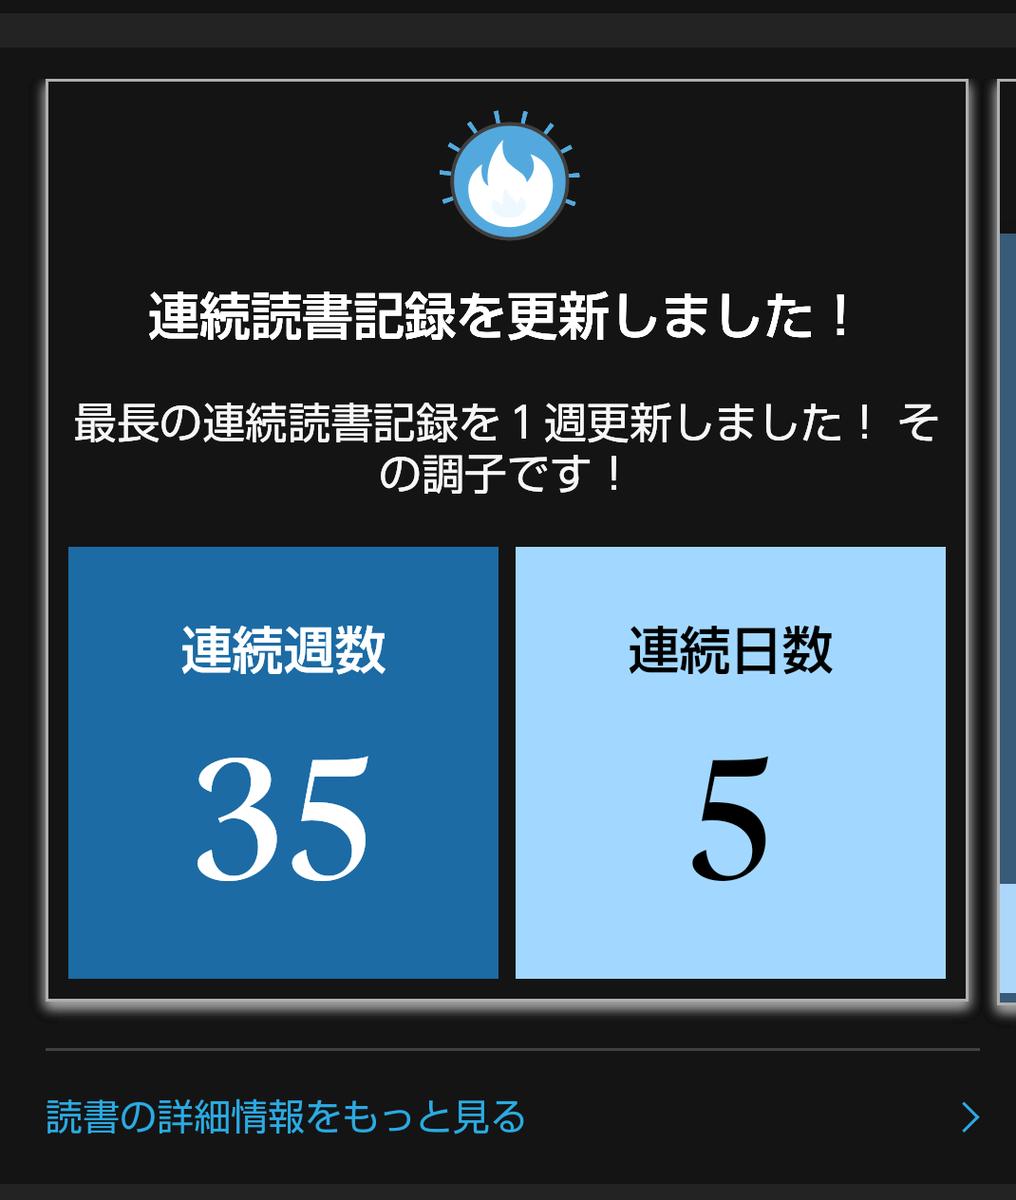 f:id:Kubonosuke:20210715232252p:plain